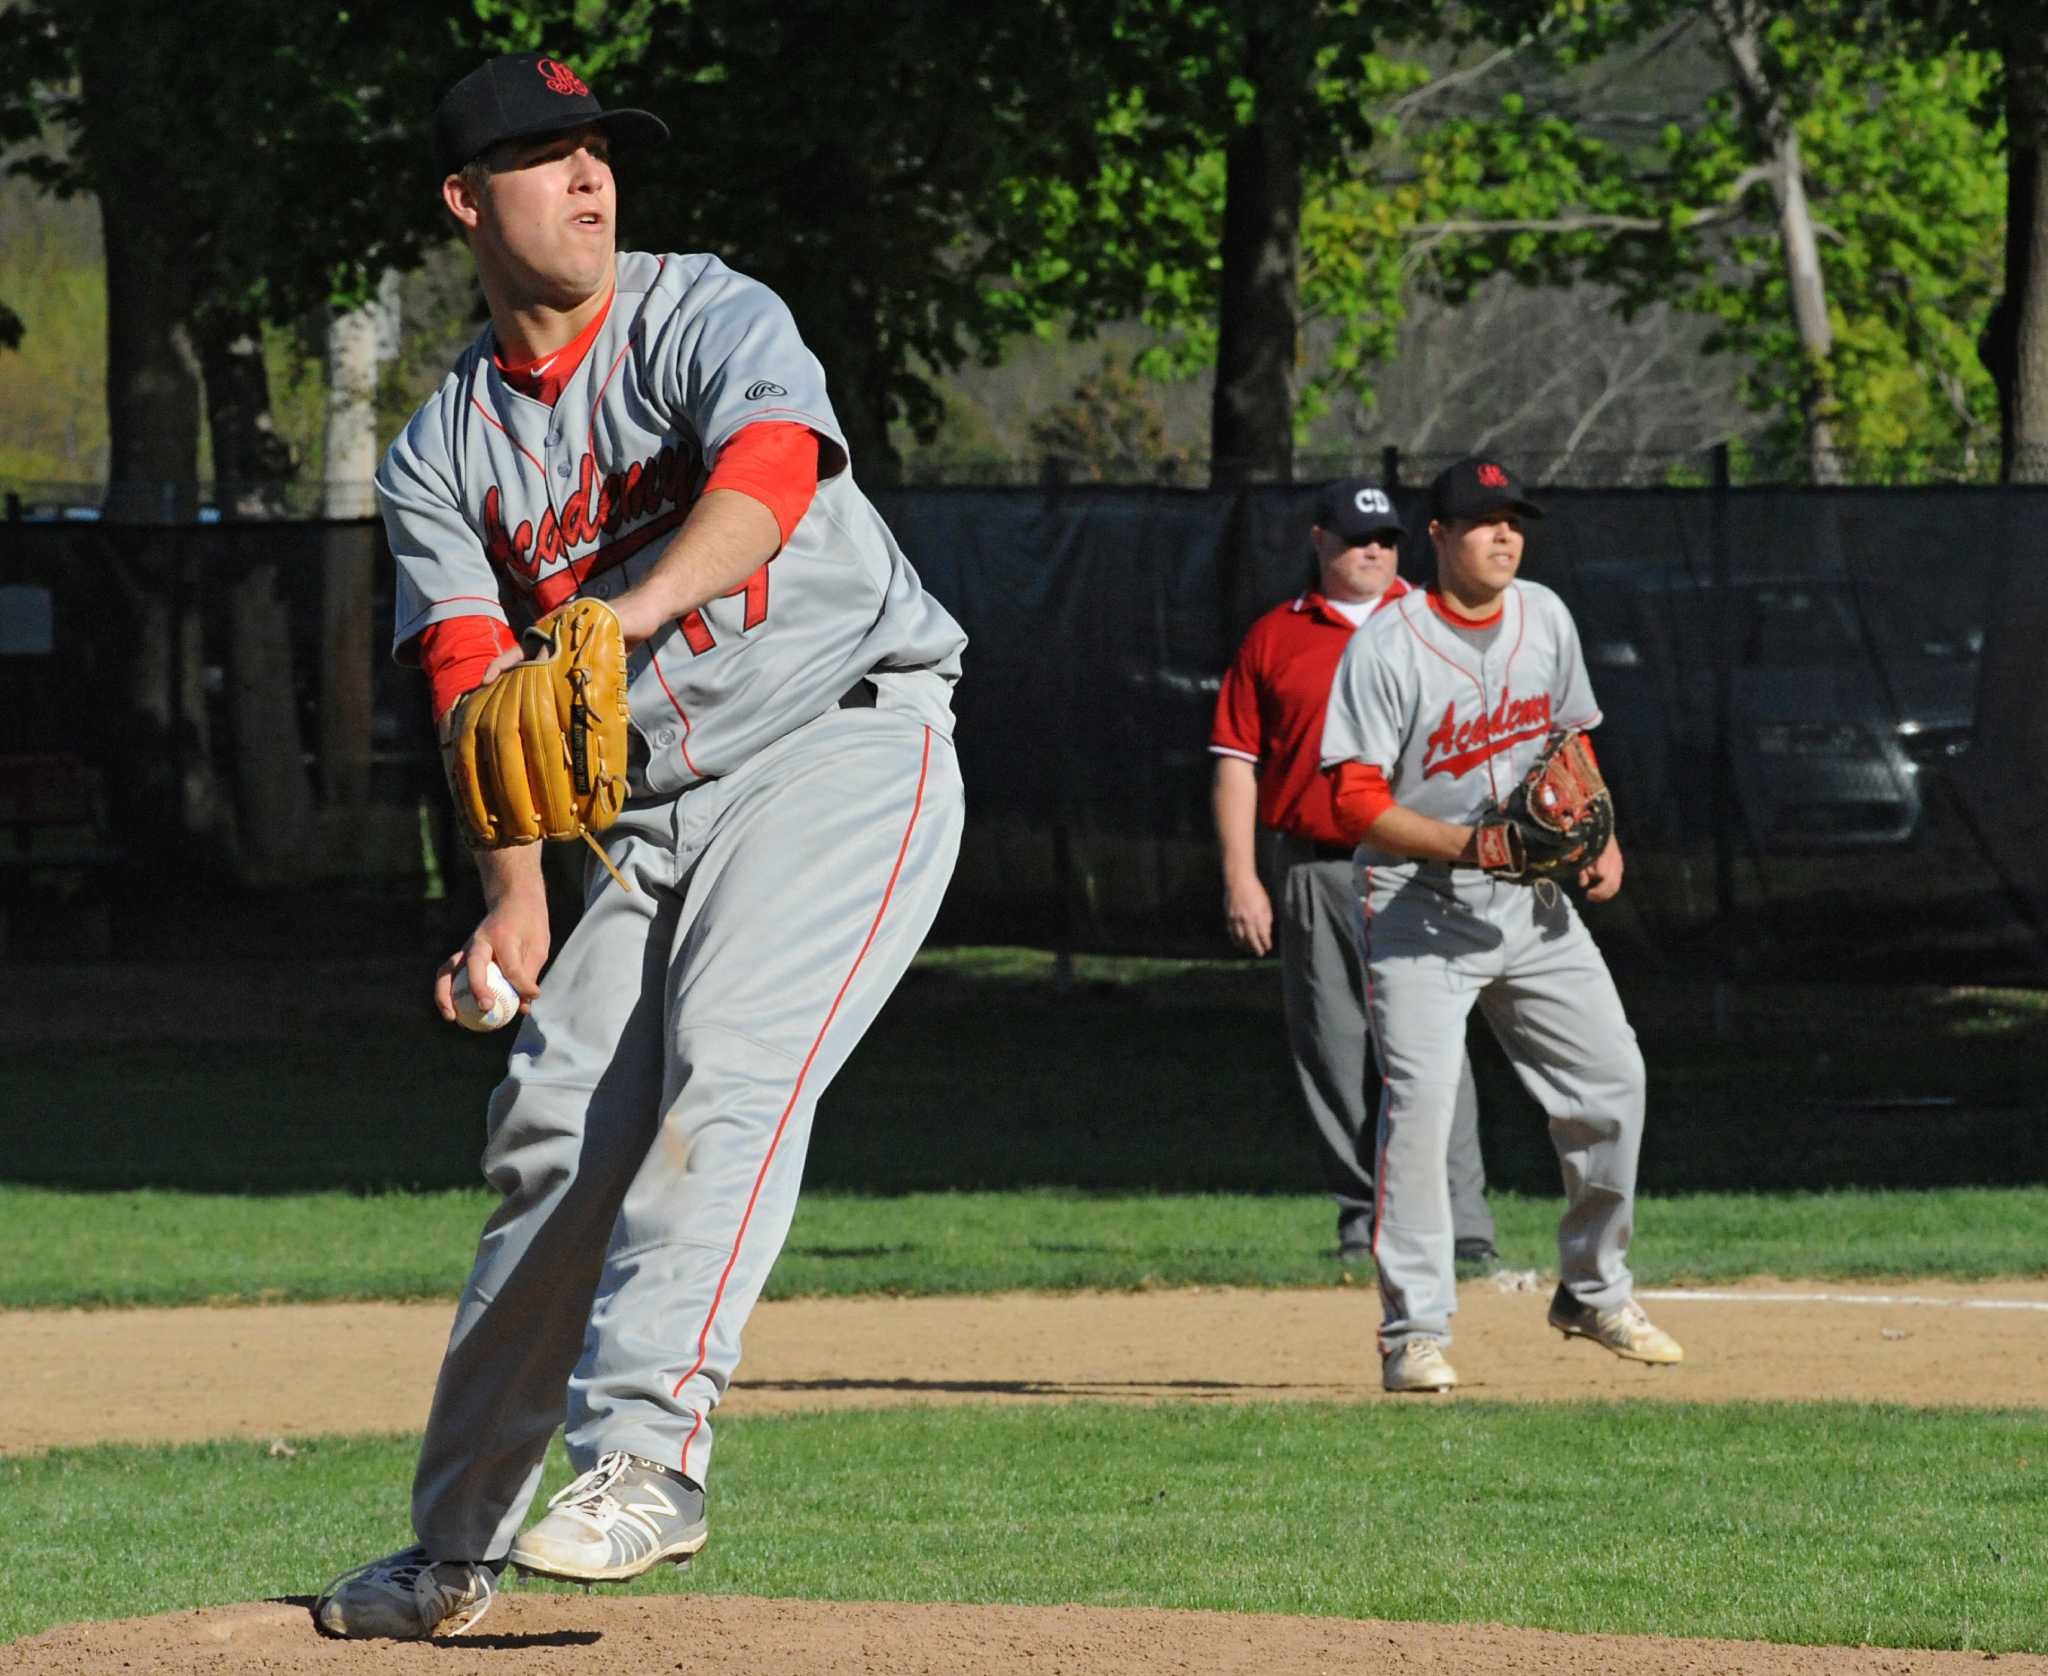 Knapeks bring their twin bill to Siena baseball